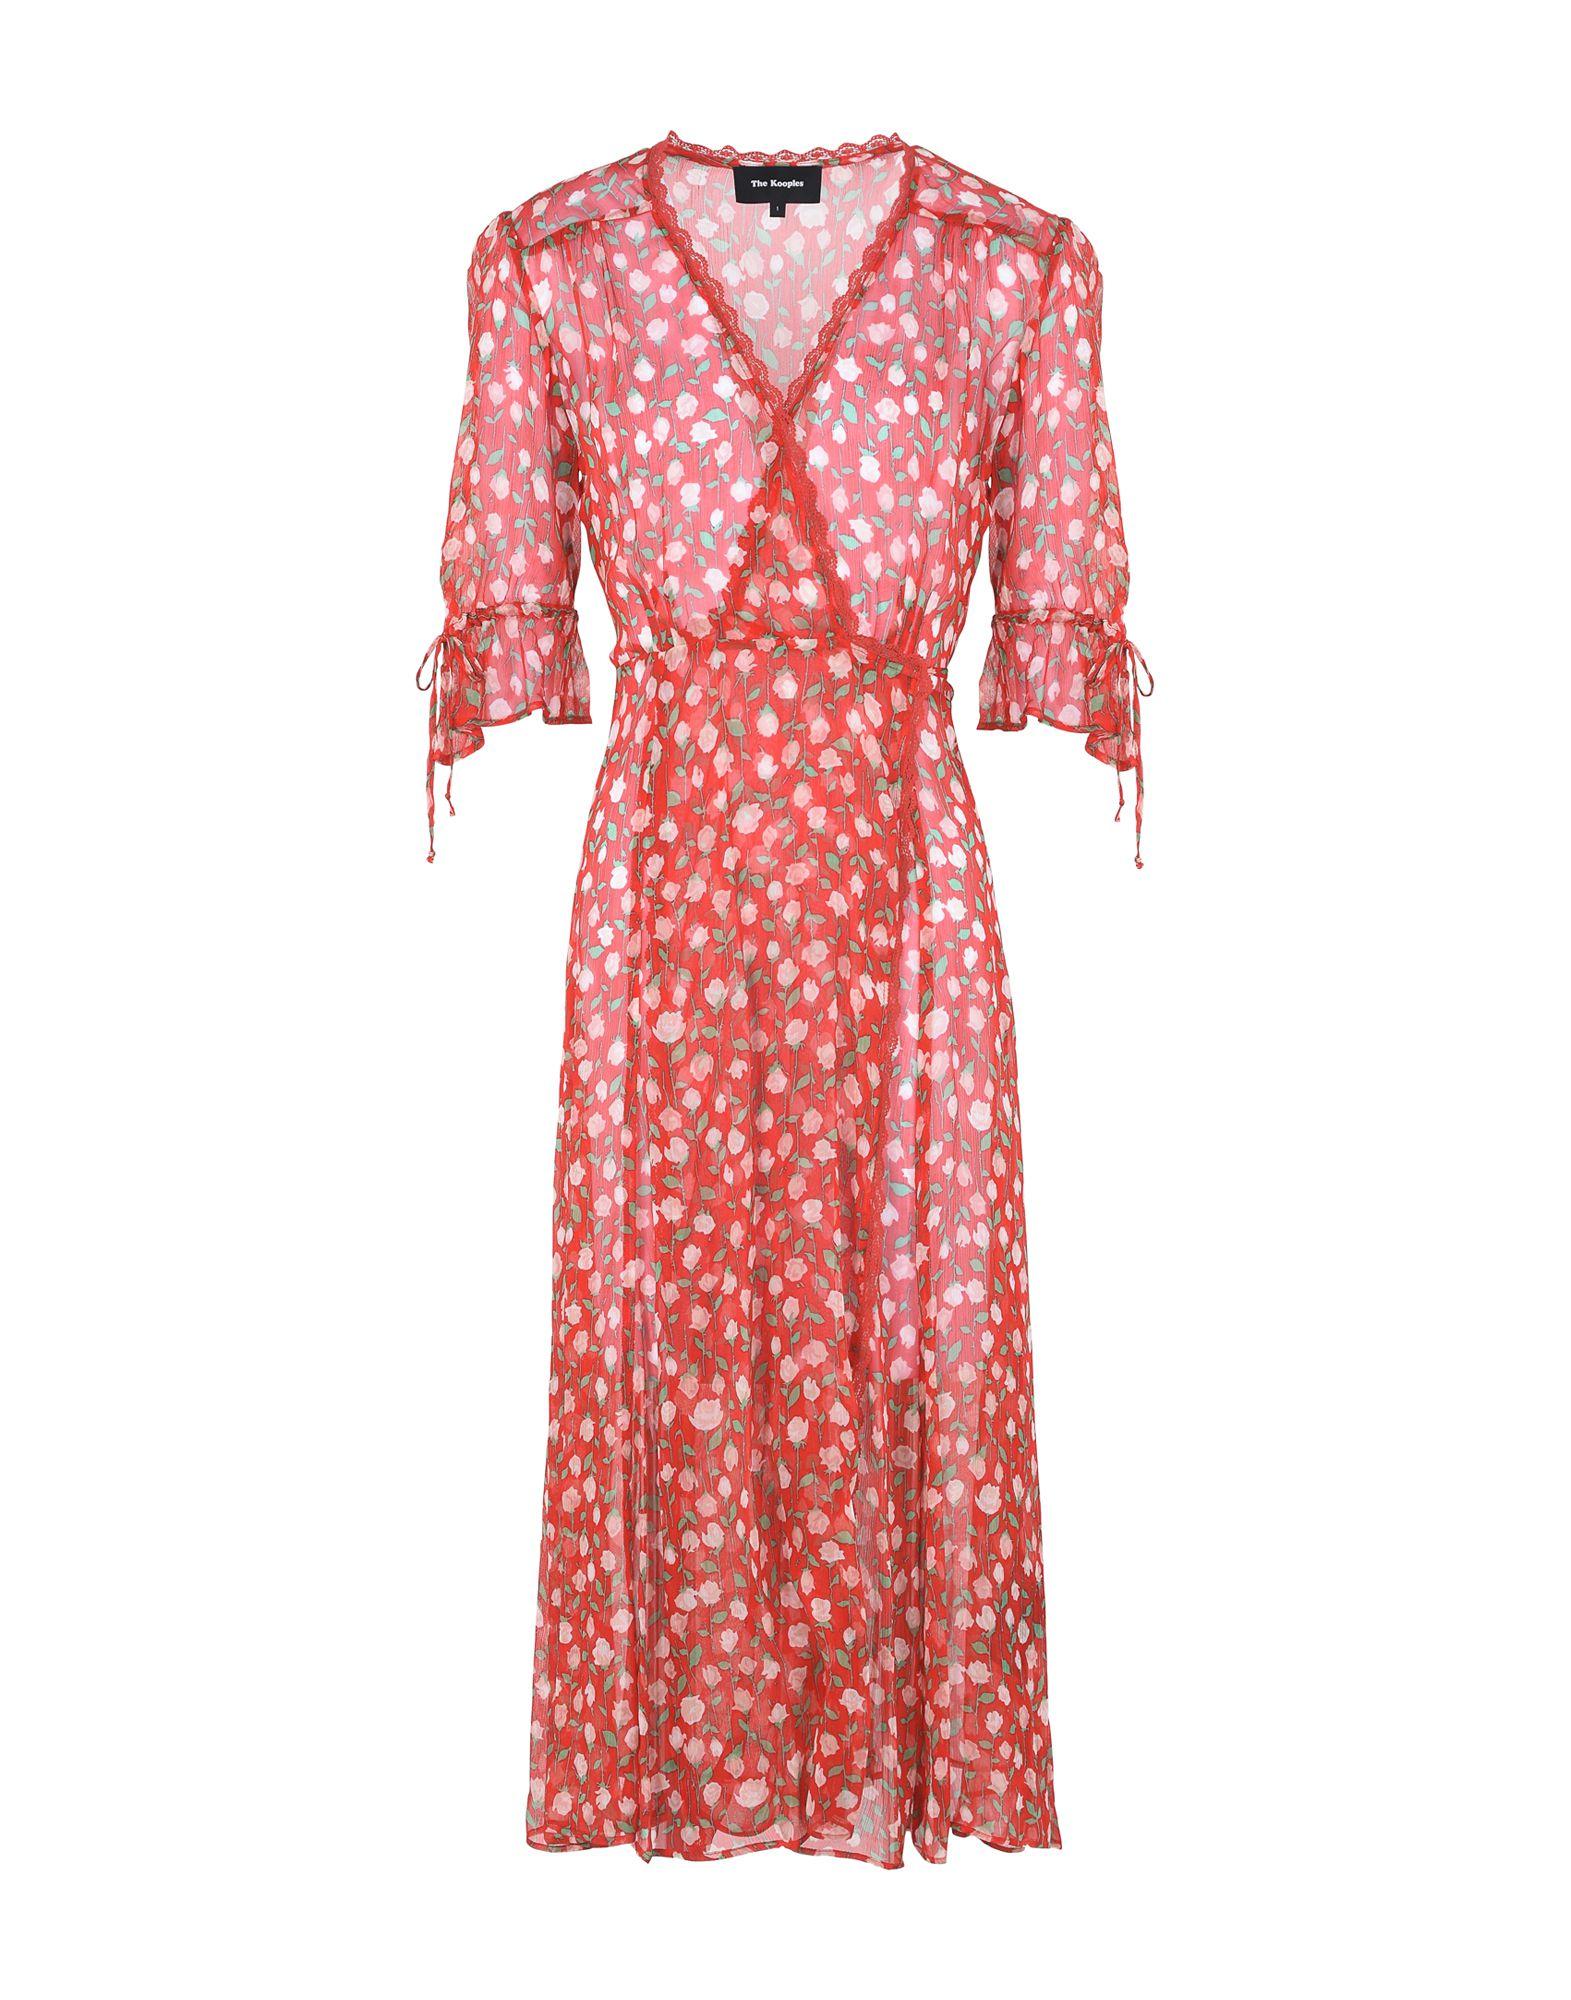 Rosa Rosa Floral-Print Midi Wrap Dress, Red